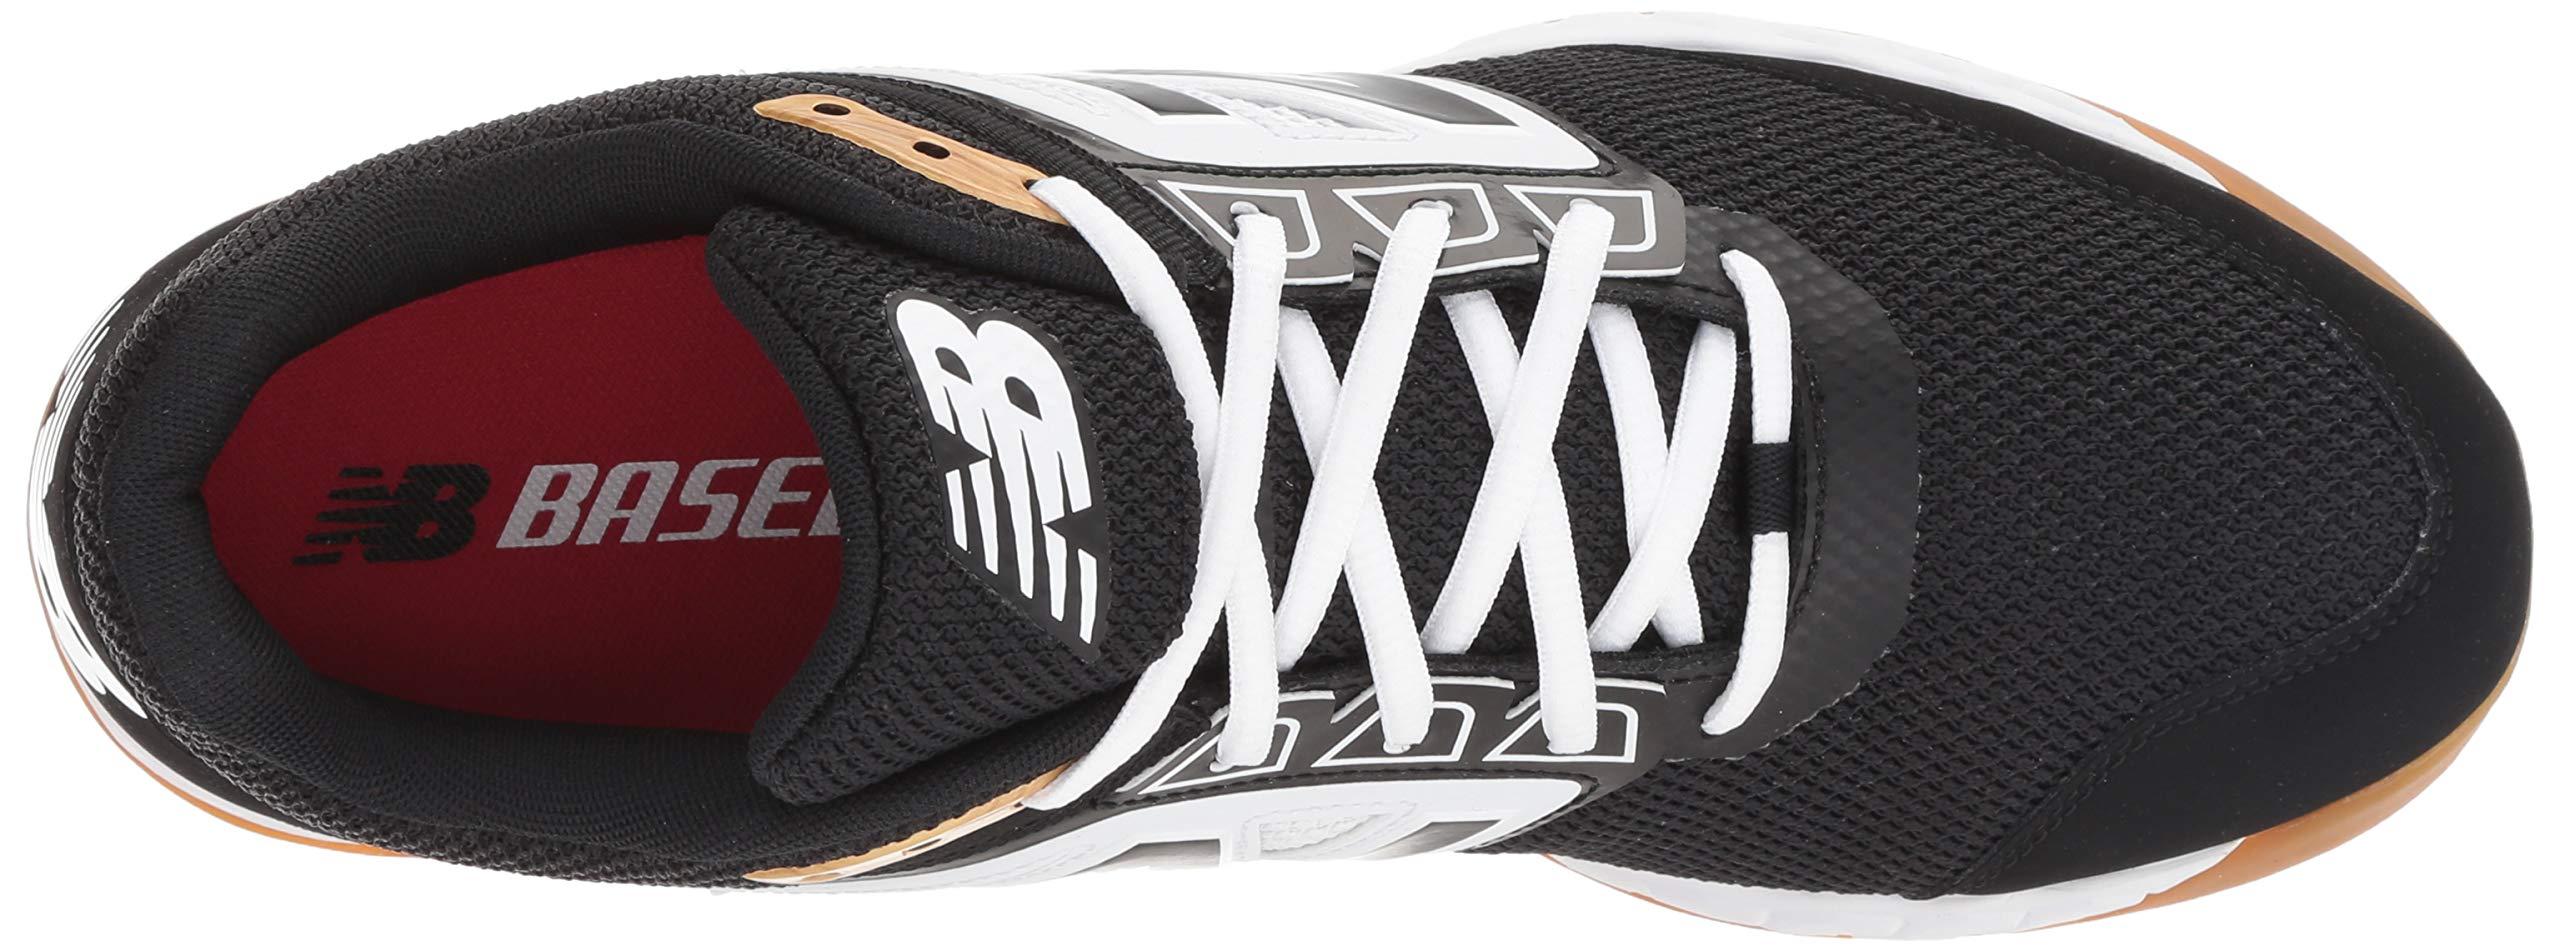 New Balance Men's 3000v4 Turf Baseball Shoe, Black/White, 5 D US by New Balance (Image #8)